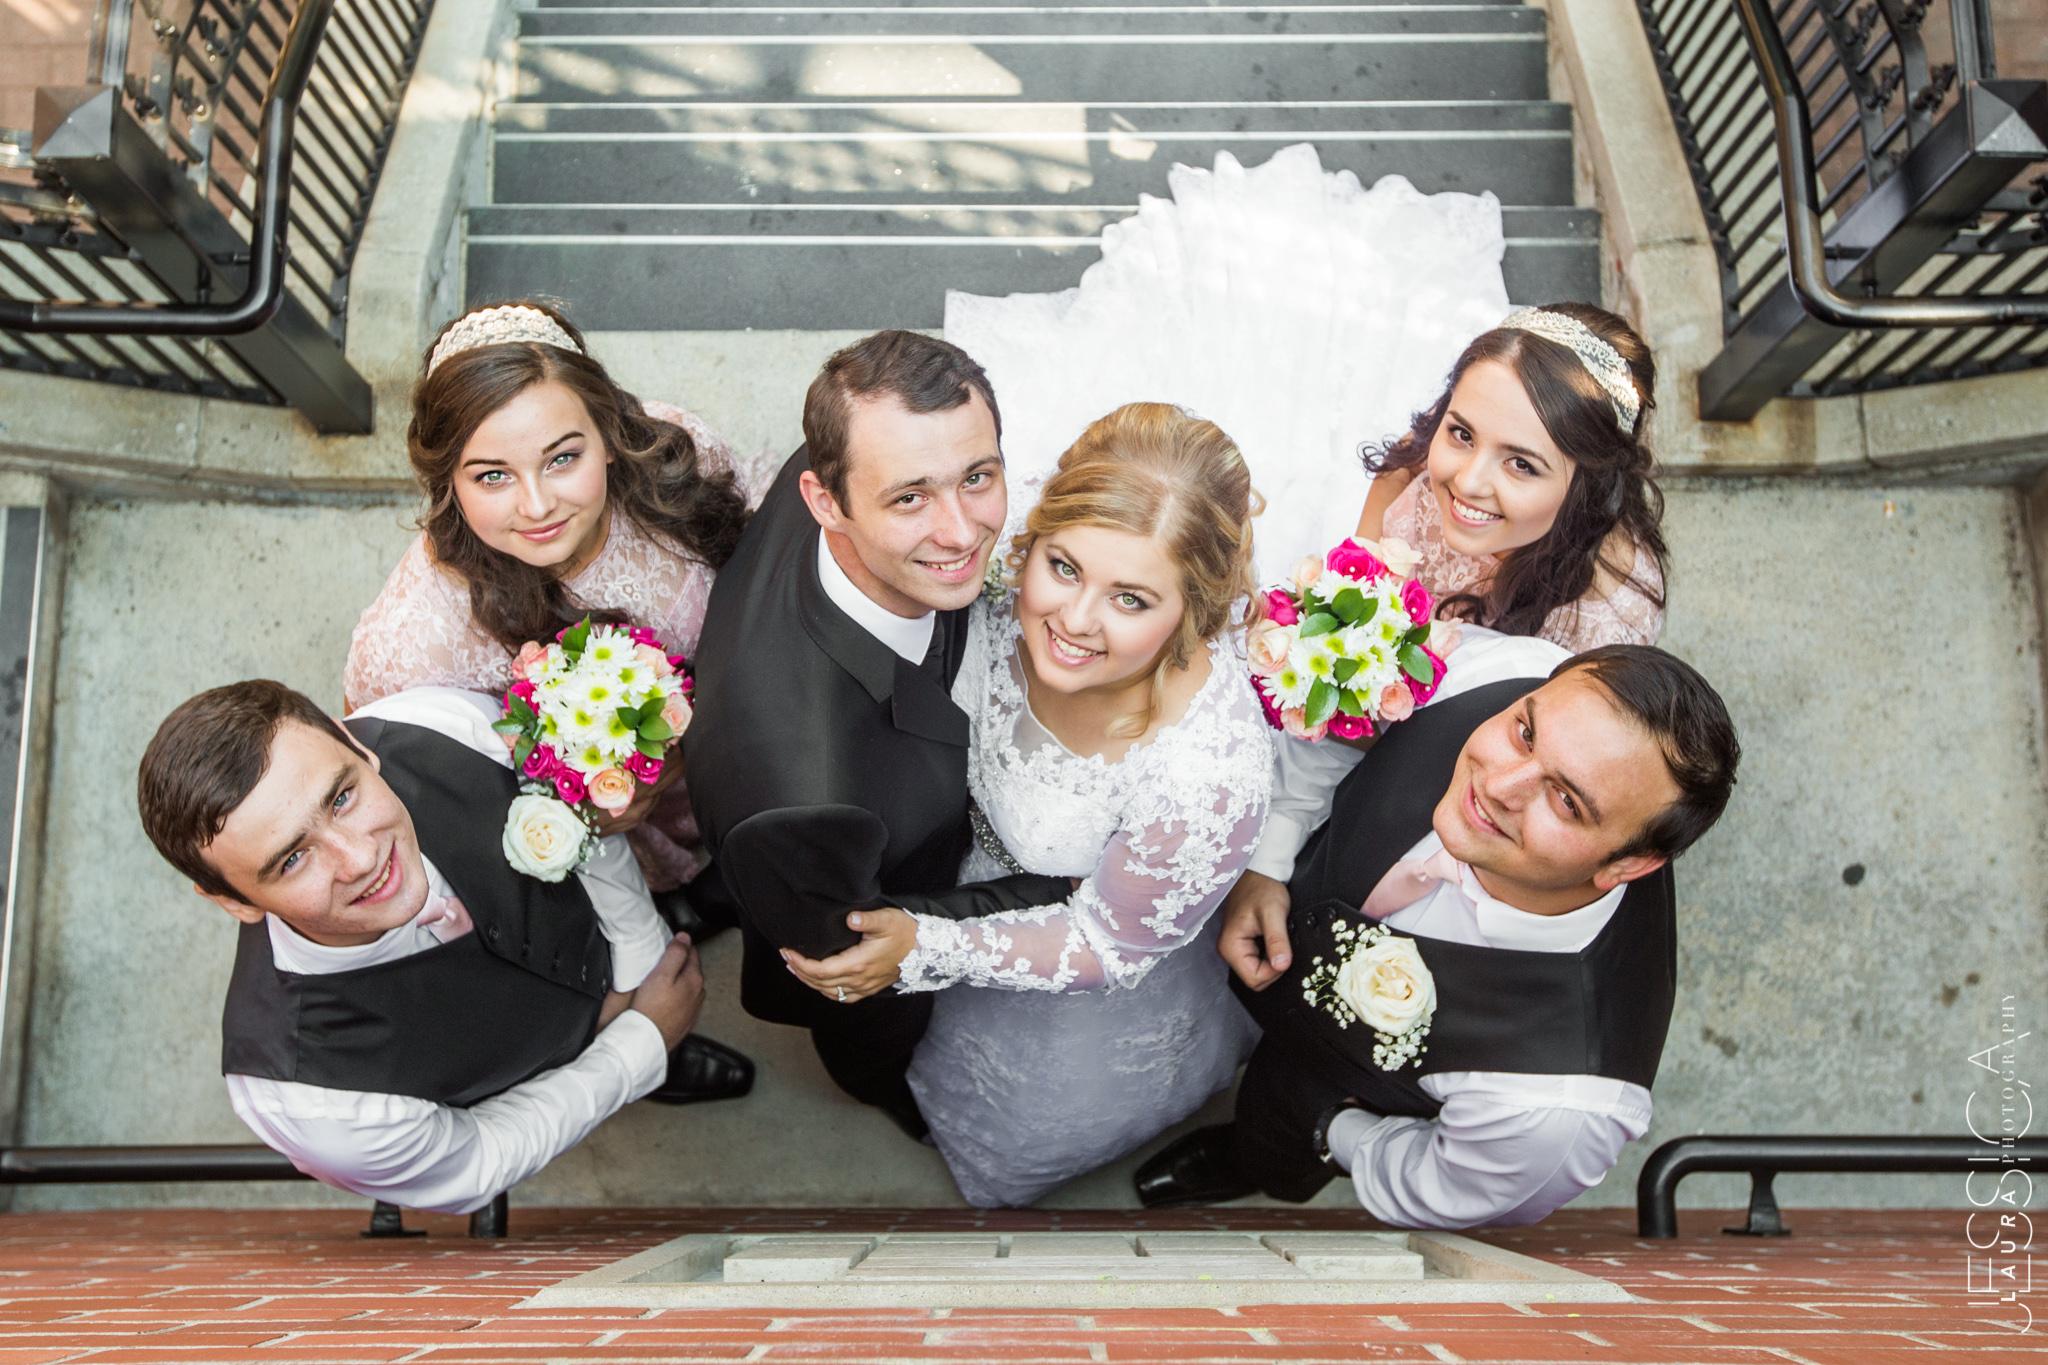 Eugene-Maryana_wedding_08062017_web (175 of 558).JPG